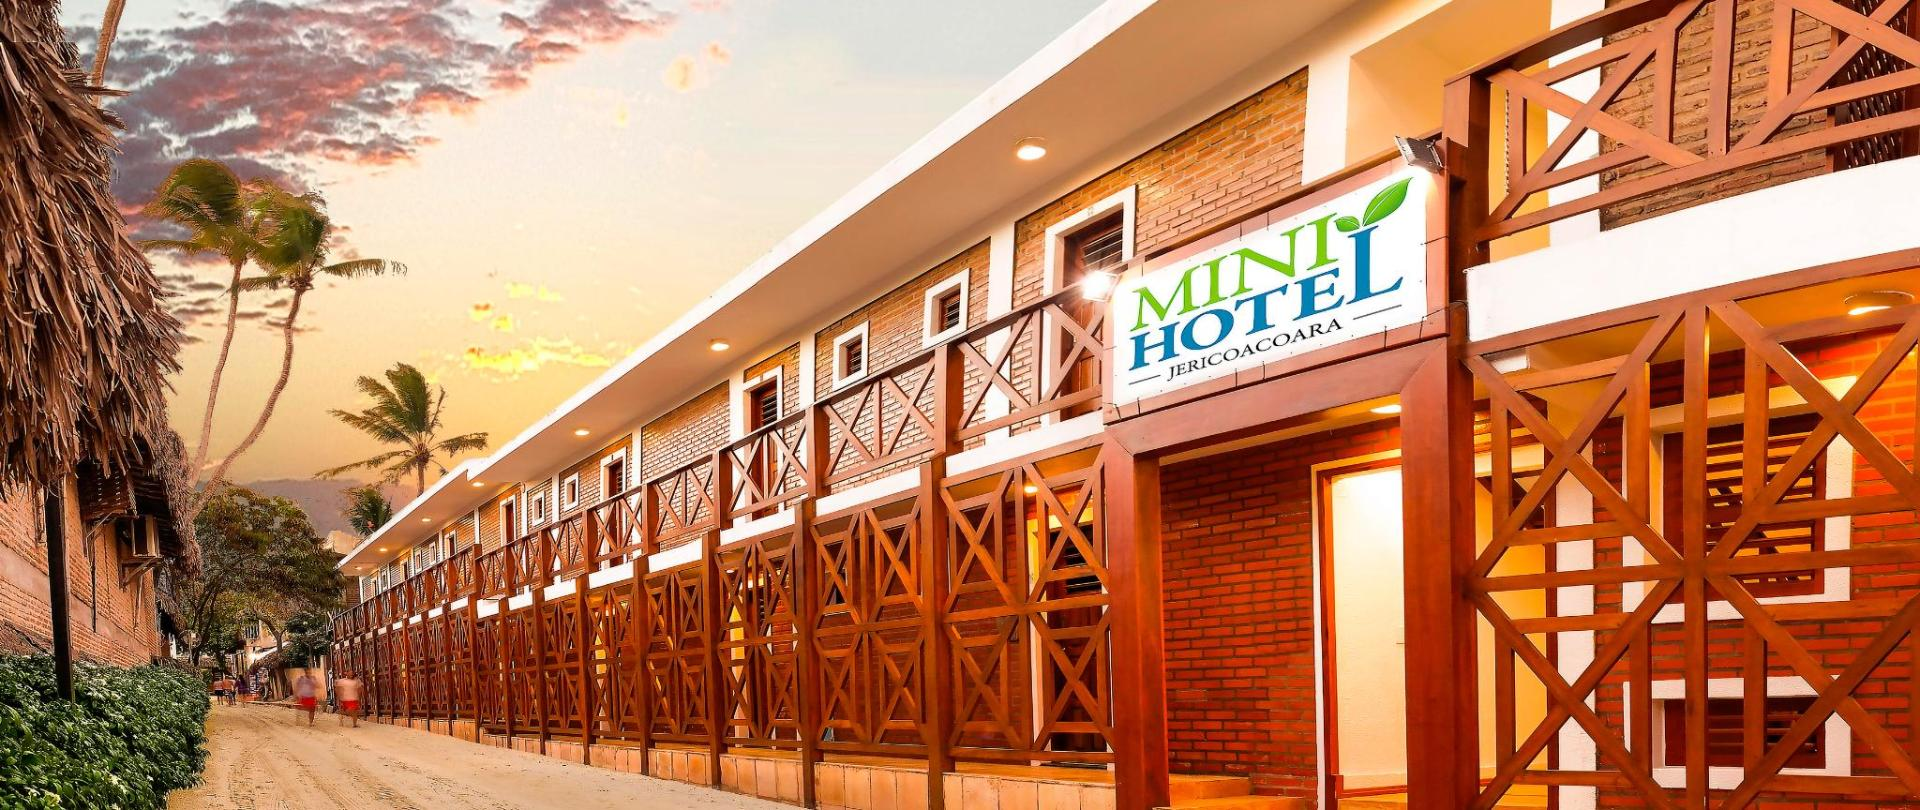 pn_mini_hotel_15a.jpg